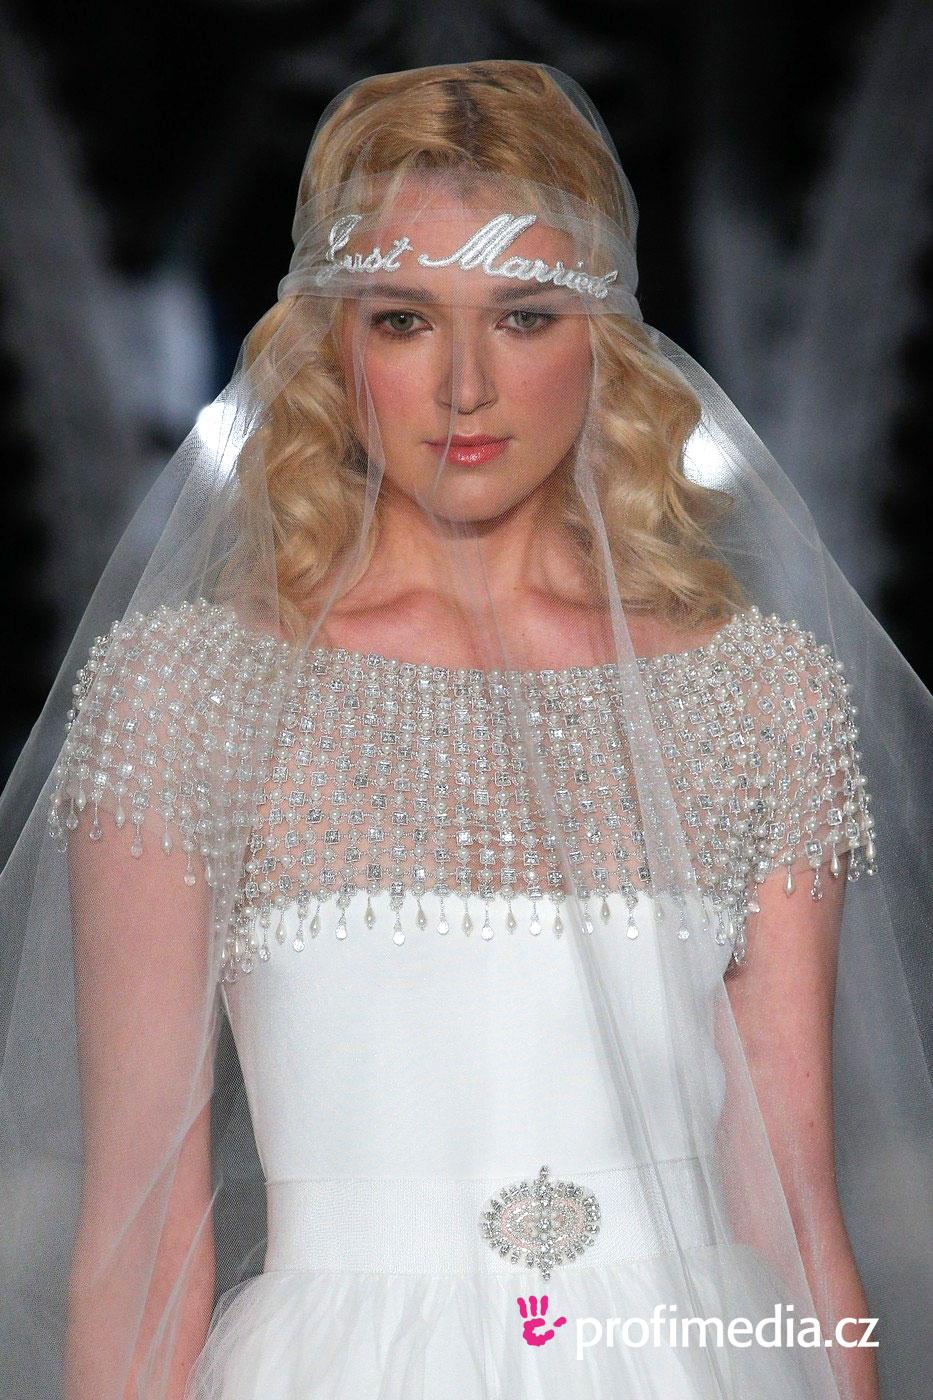 Reem acra coiffure happyhair for Miroir virtuel coiffure